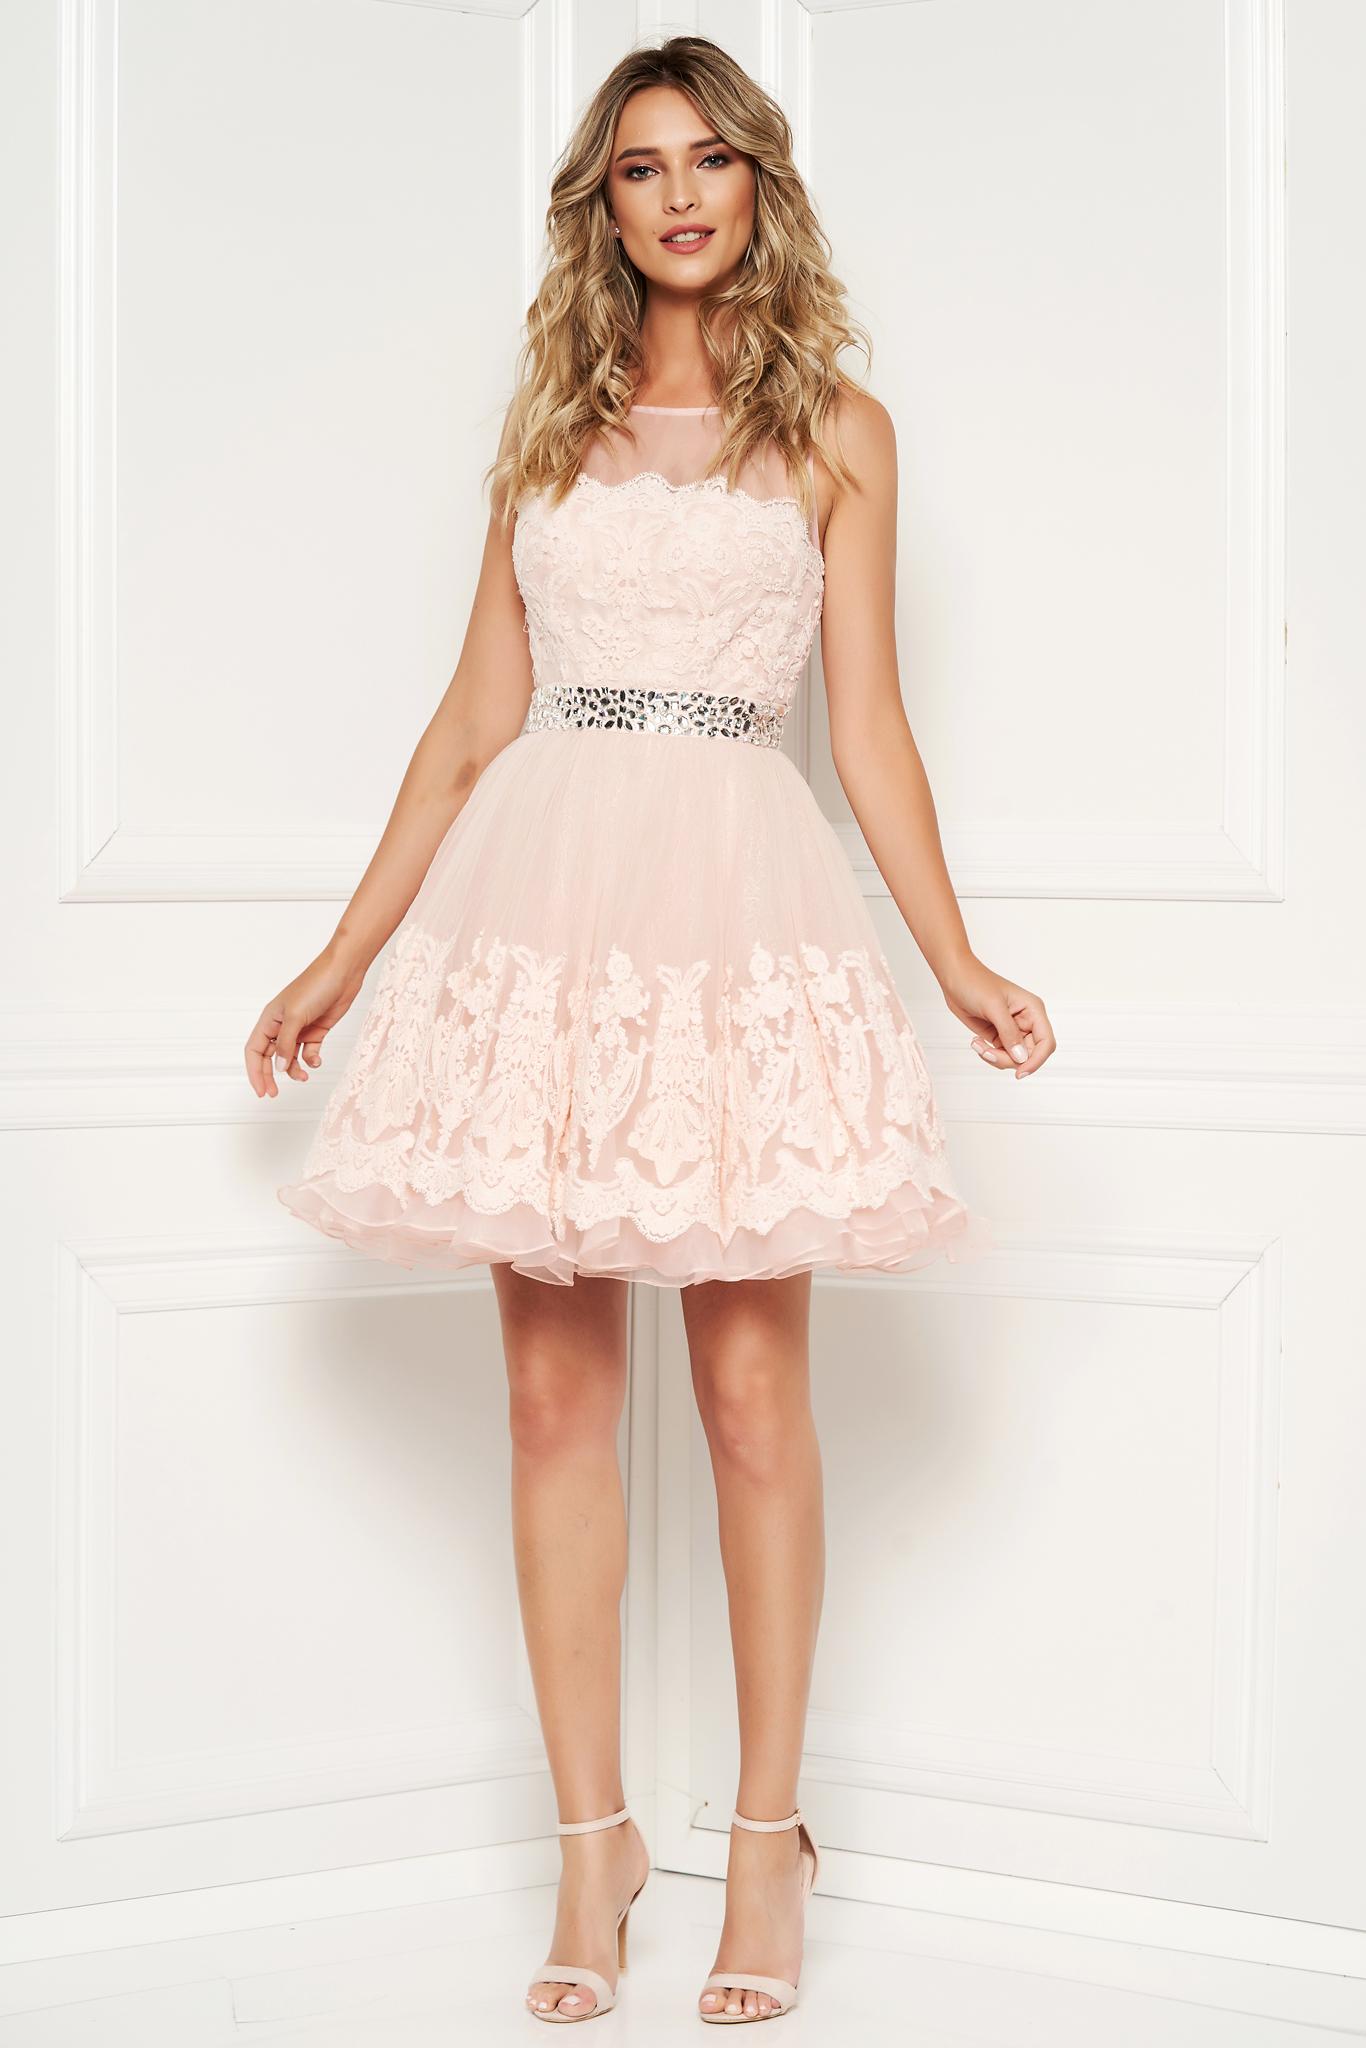 Sherri Hill rosa luxurious dress